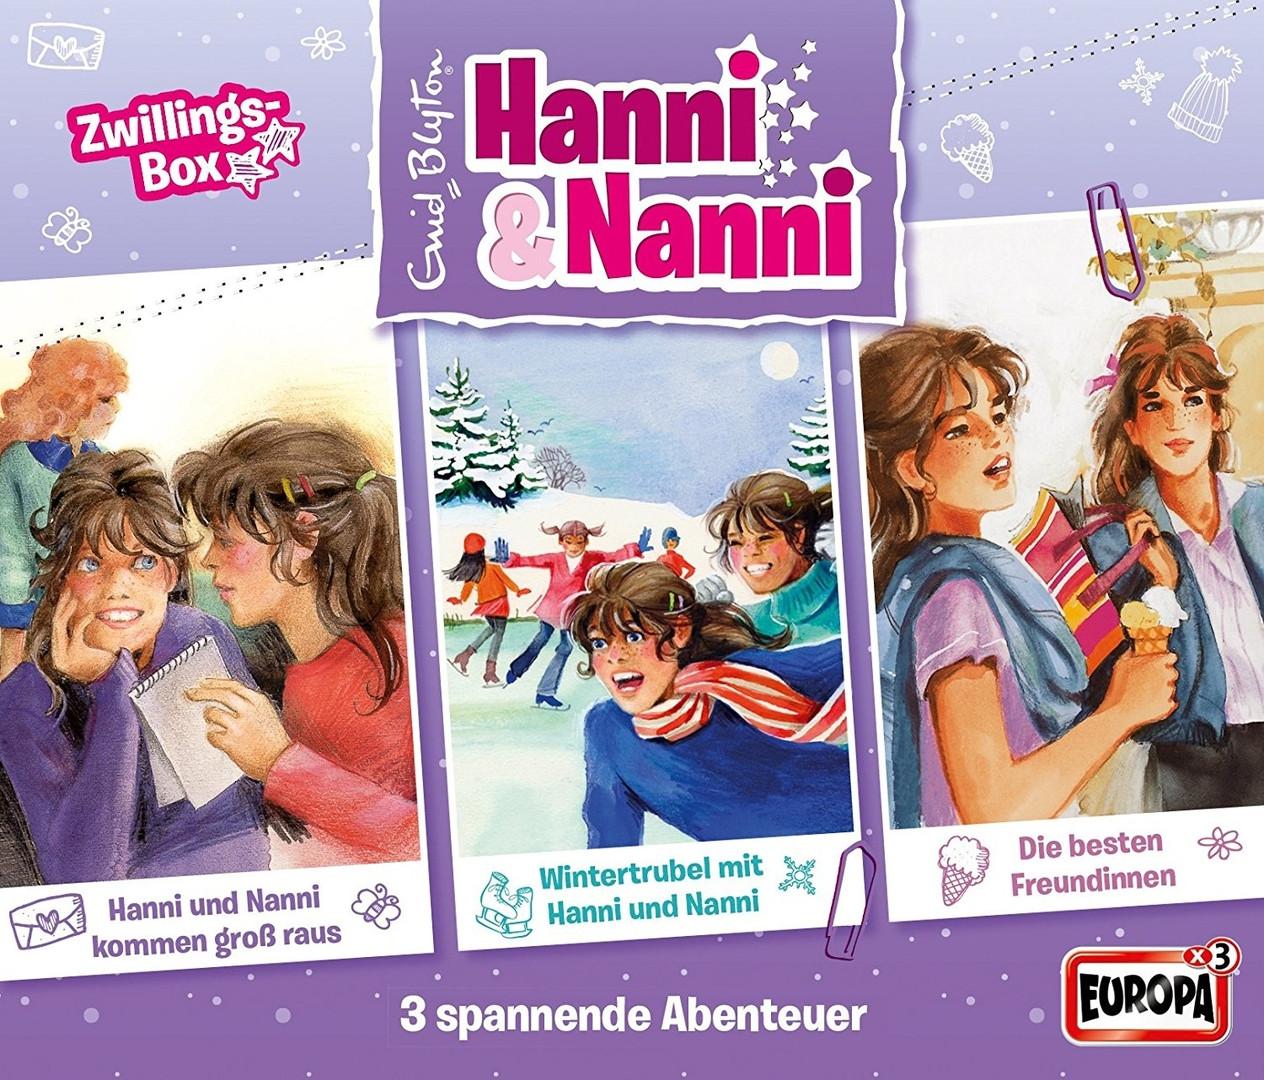 Hanni und Nanni -3er Box: Zwillingsbox